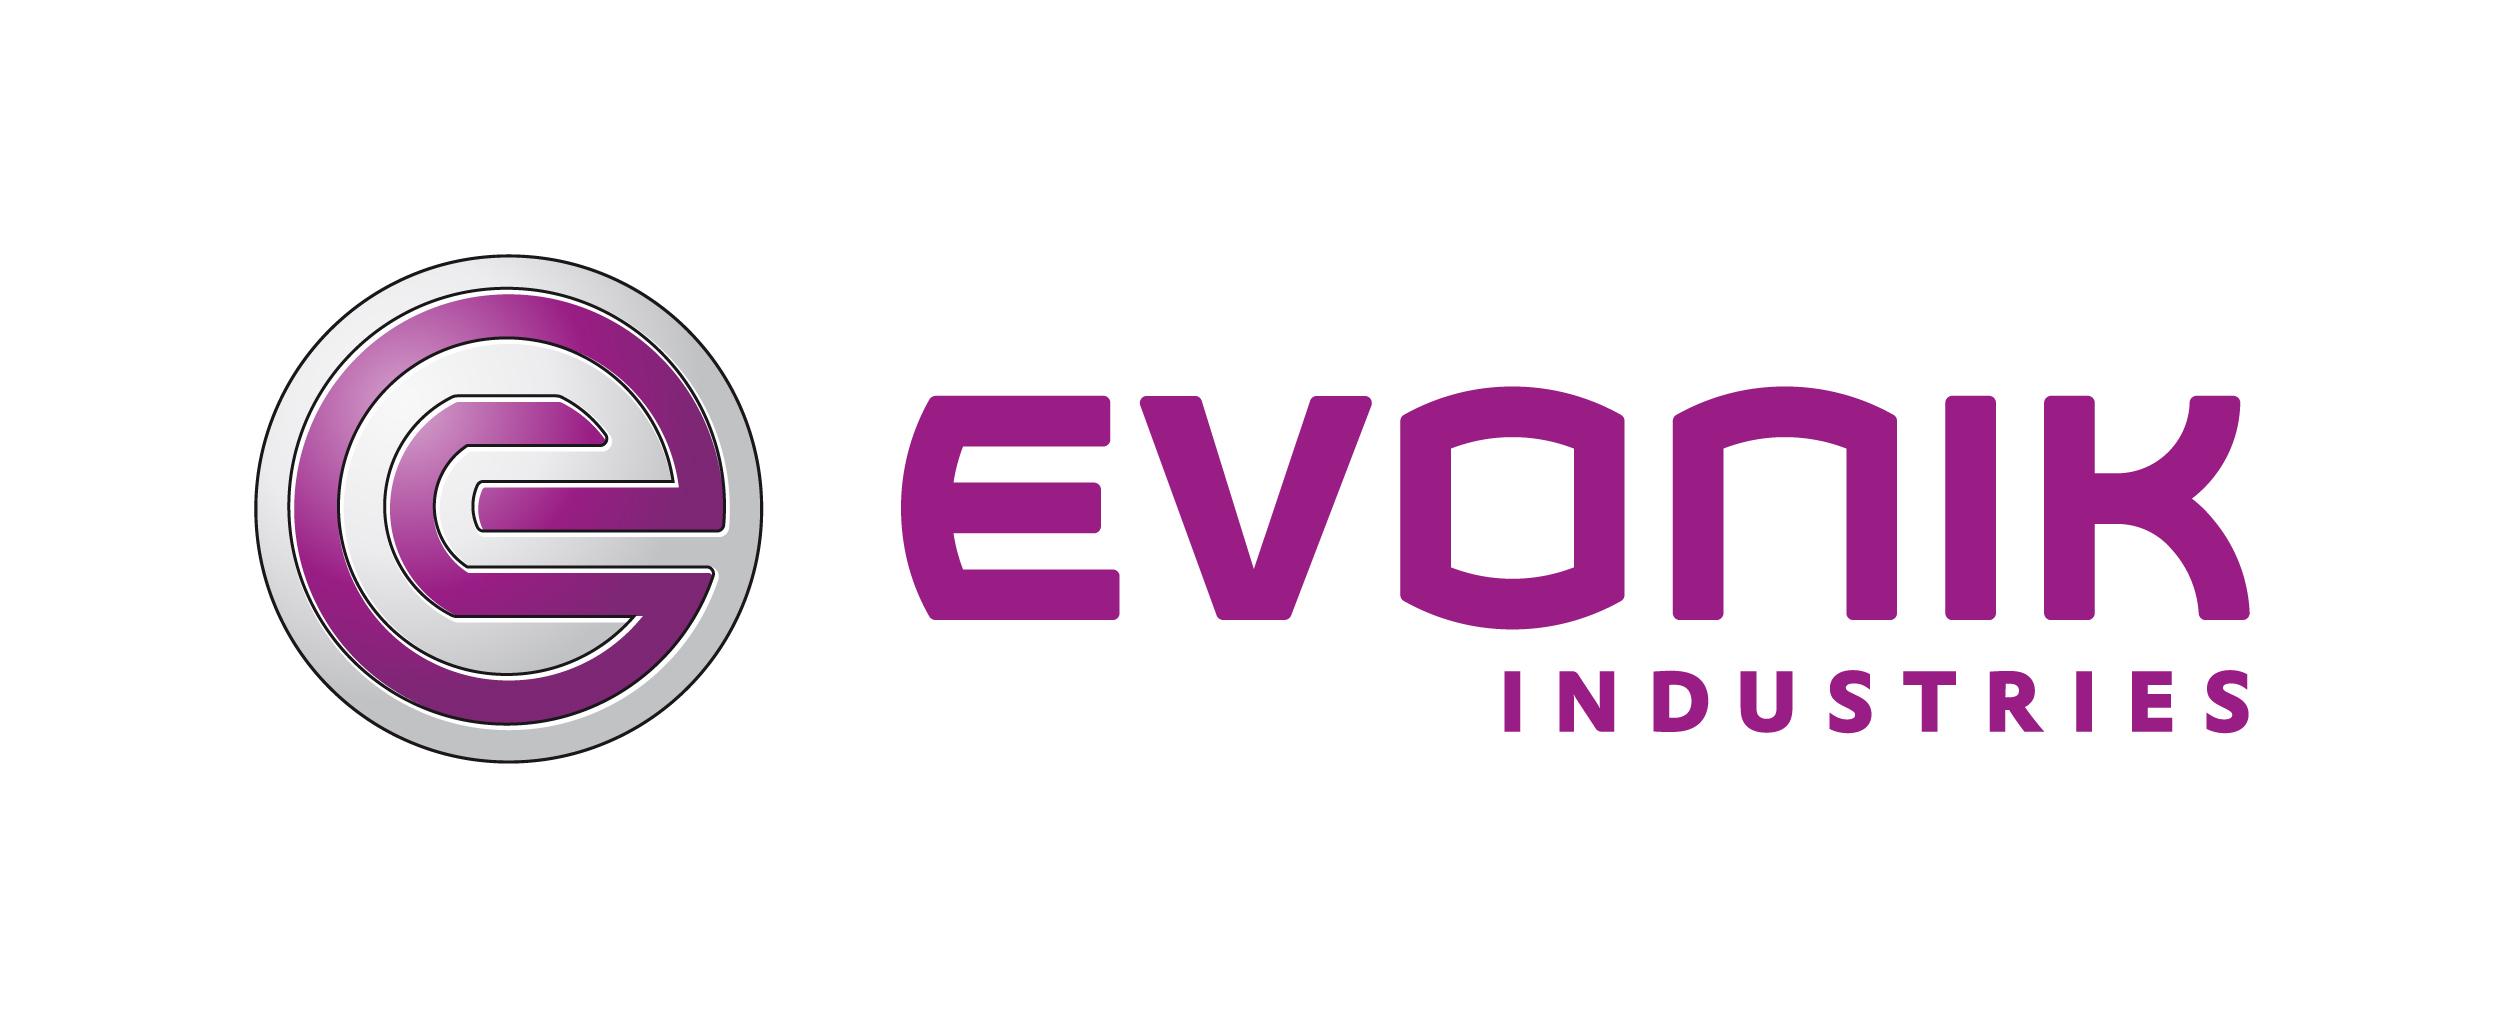 Evonik Industries Logo (Source: Evonik Industries)